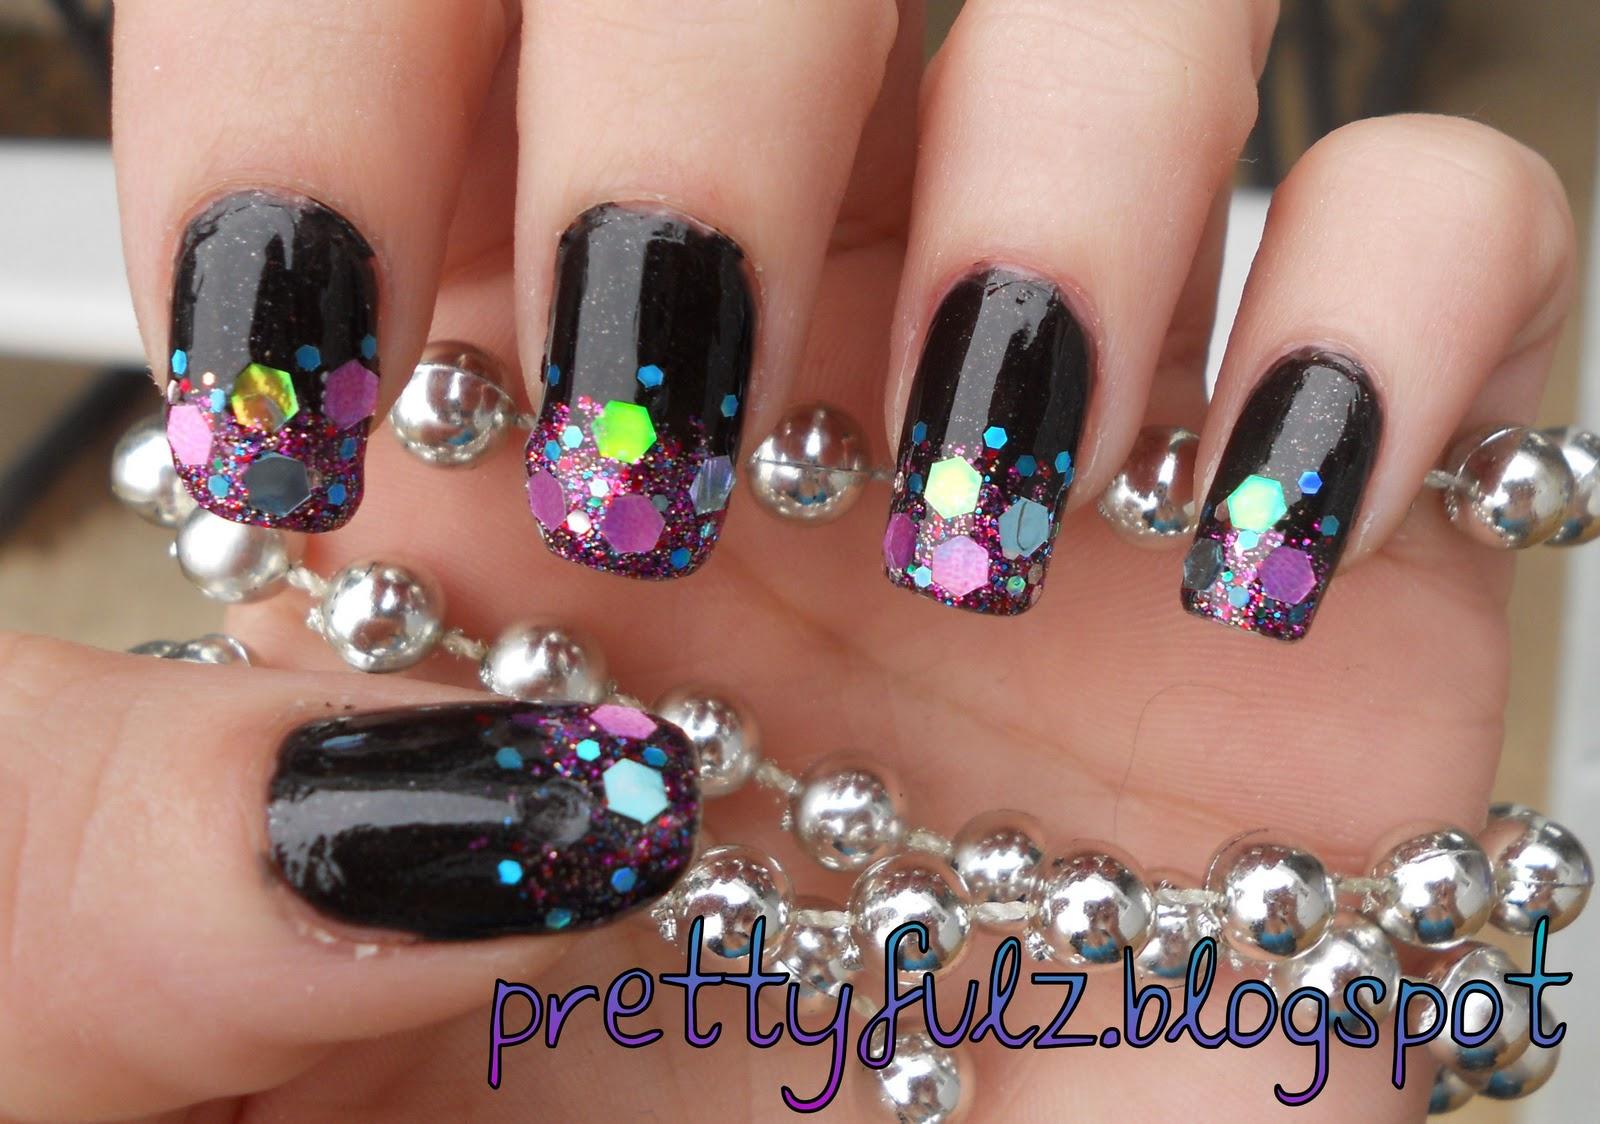 Prettyfulz Cute Nail Art Design Glitter Amp Shimmer Nail Art Design